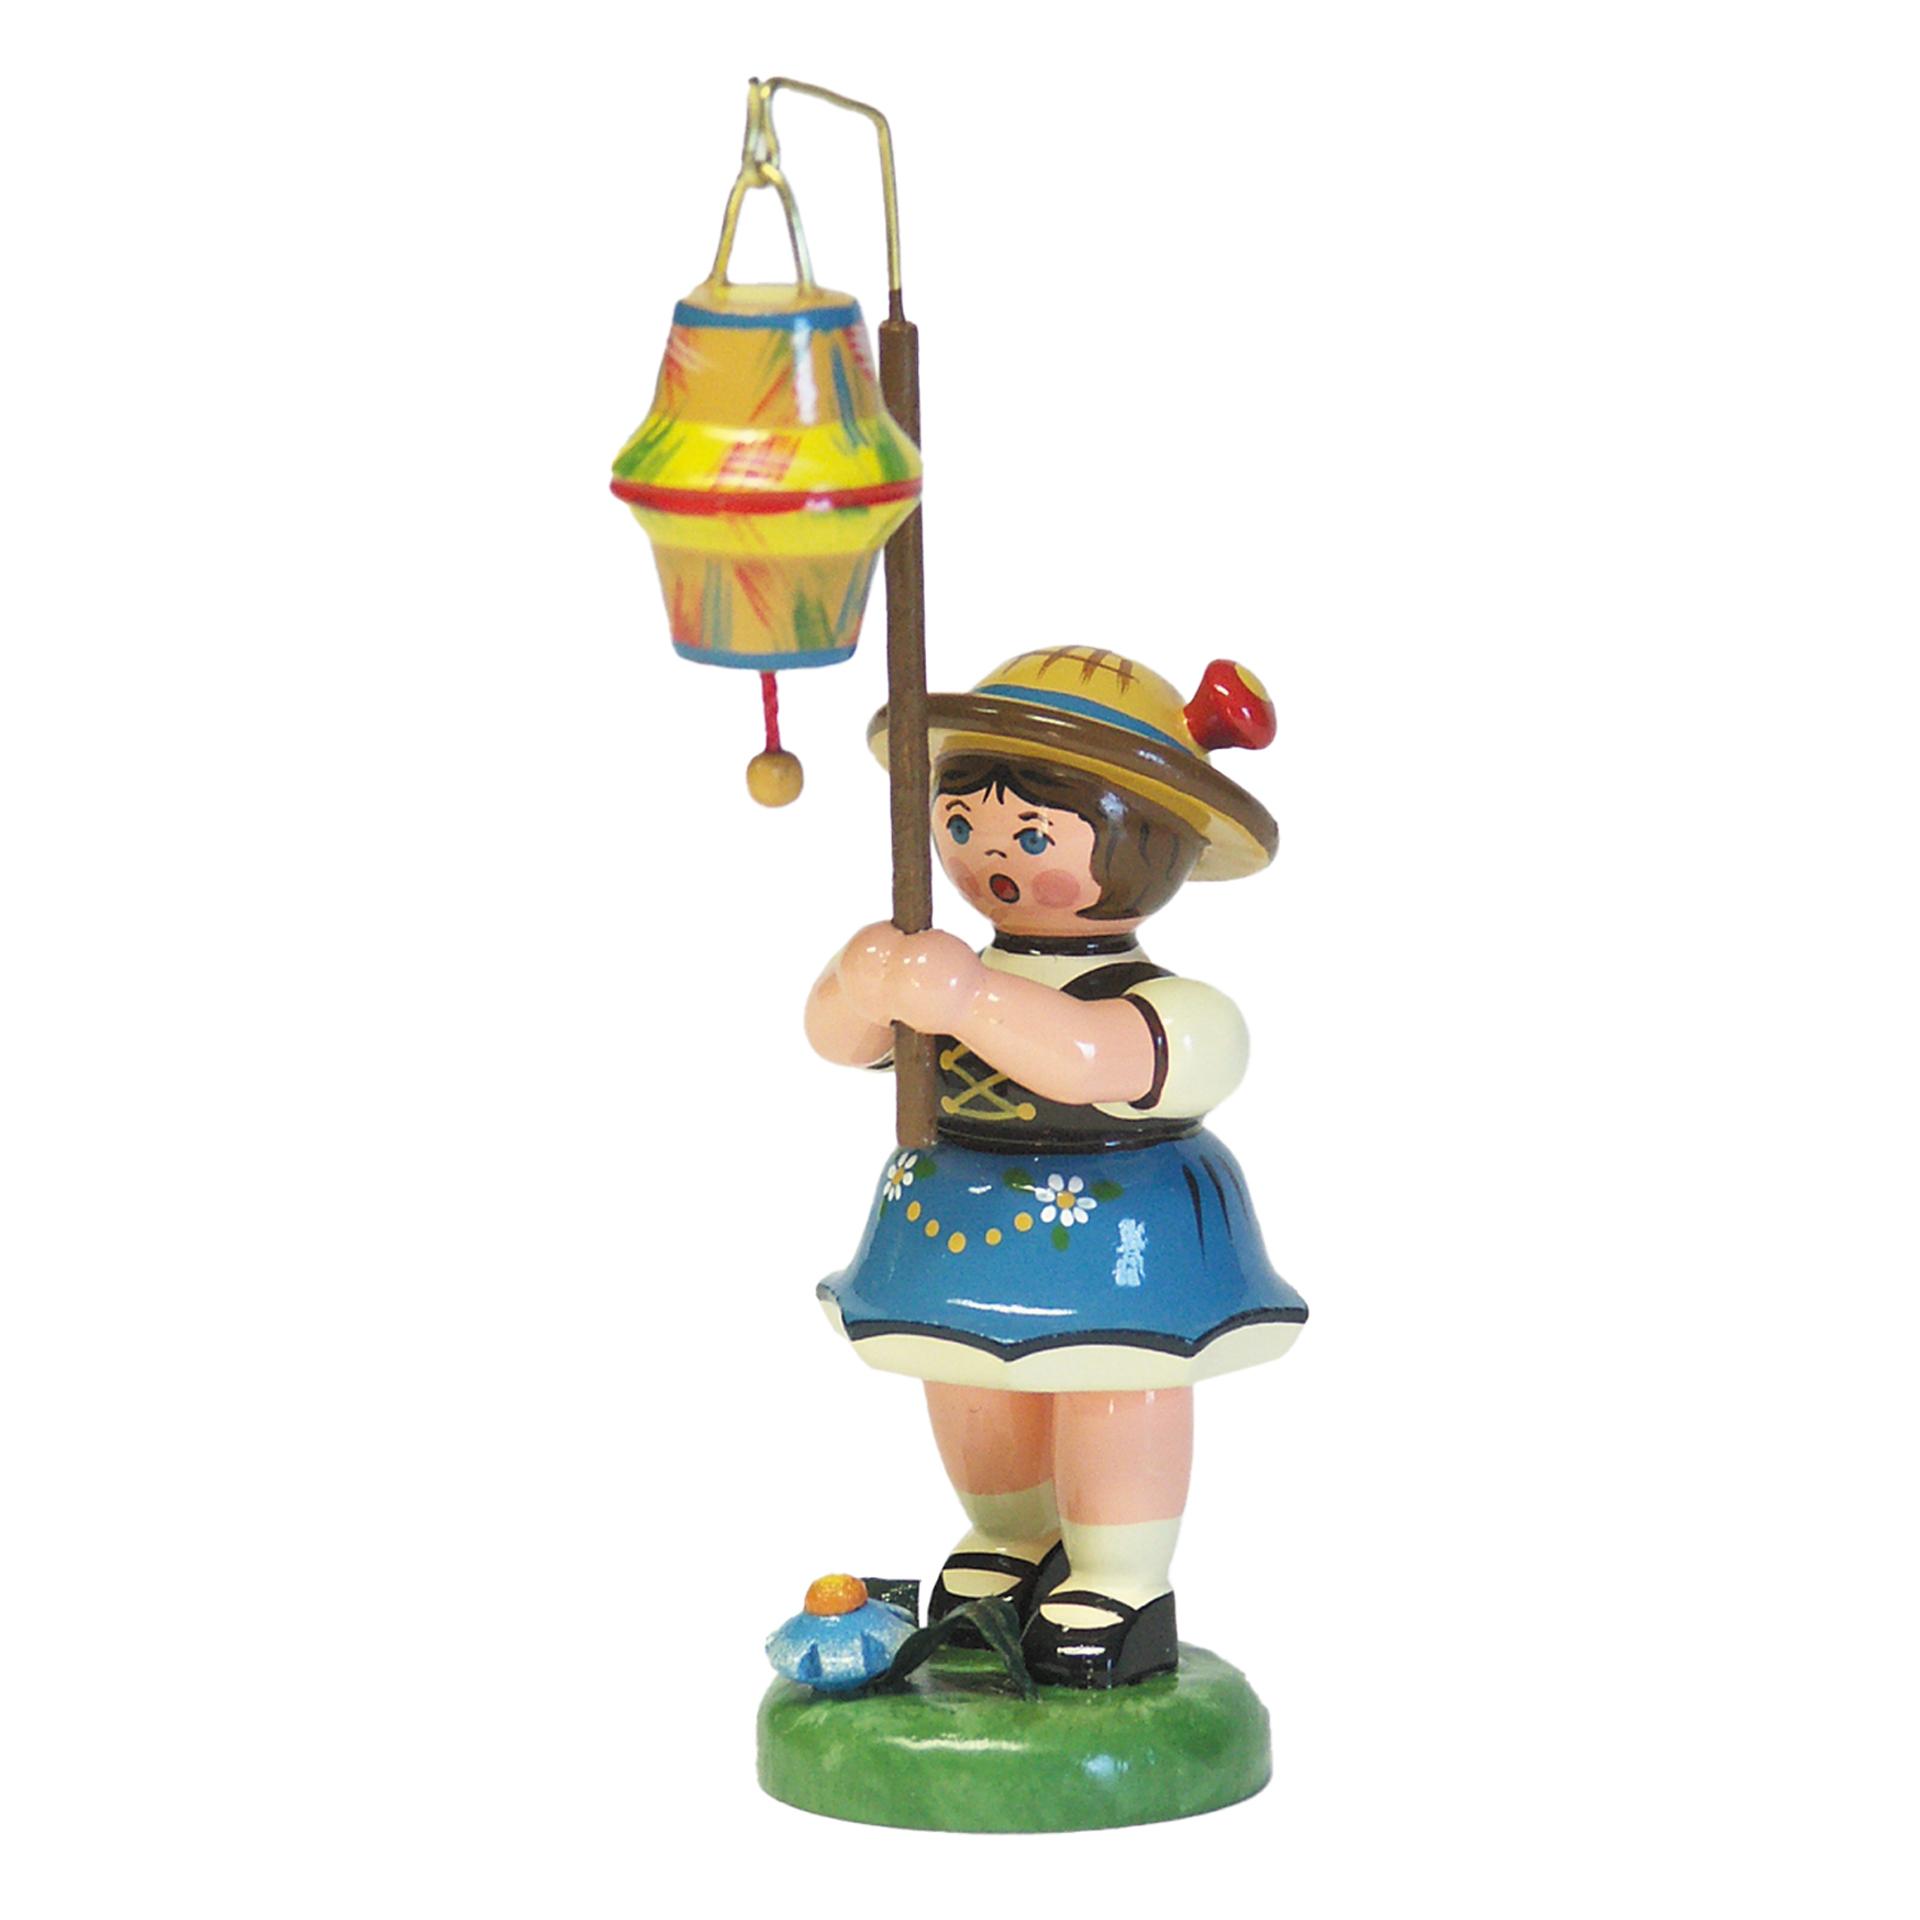 Lampionkind Mädchen mit kegelförmigem Lampion